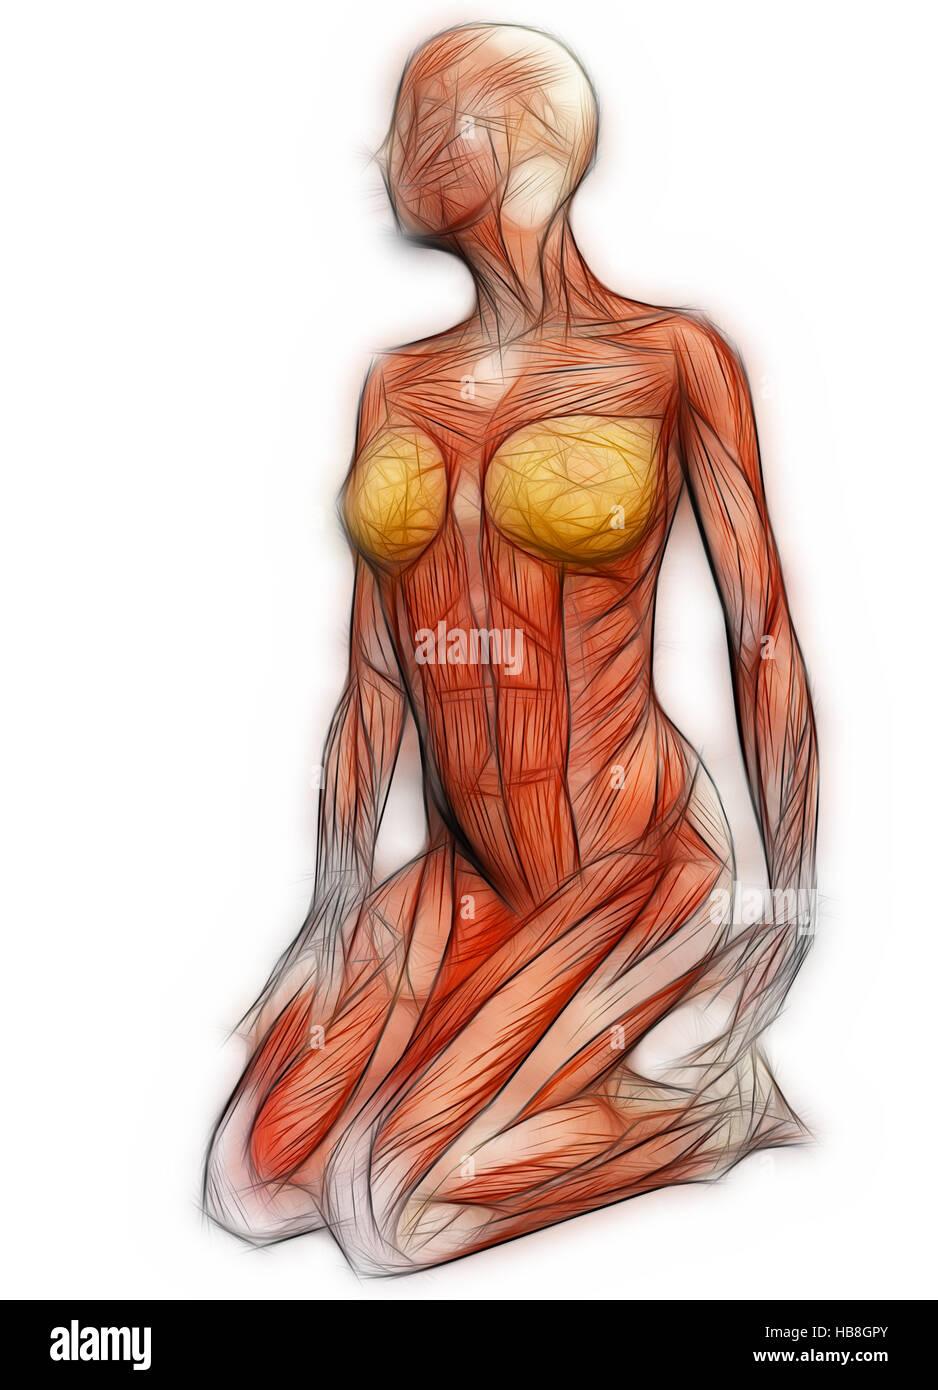 Human Muscles Imágenes De Stock & Human Muscles Fotos De Stock - Alamy